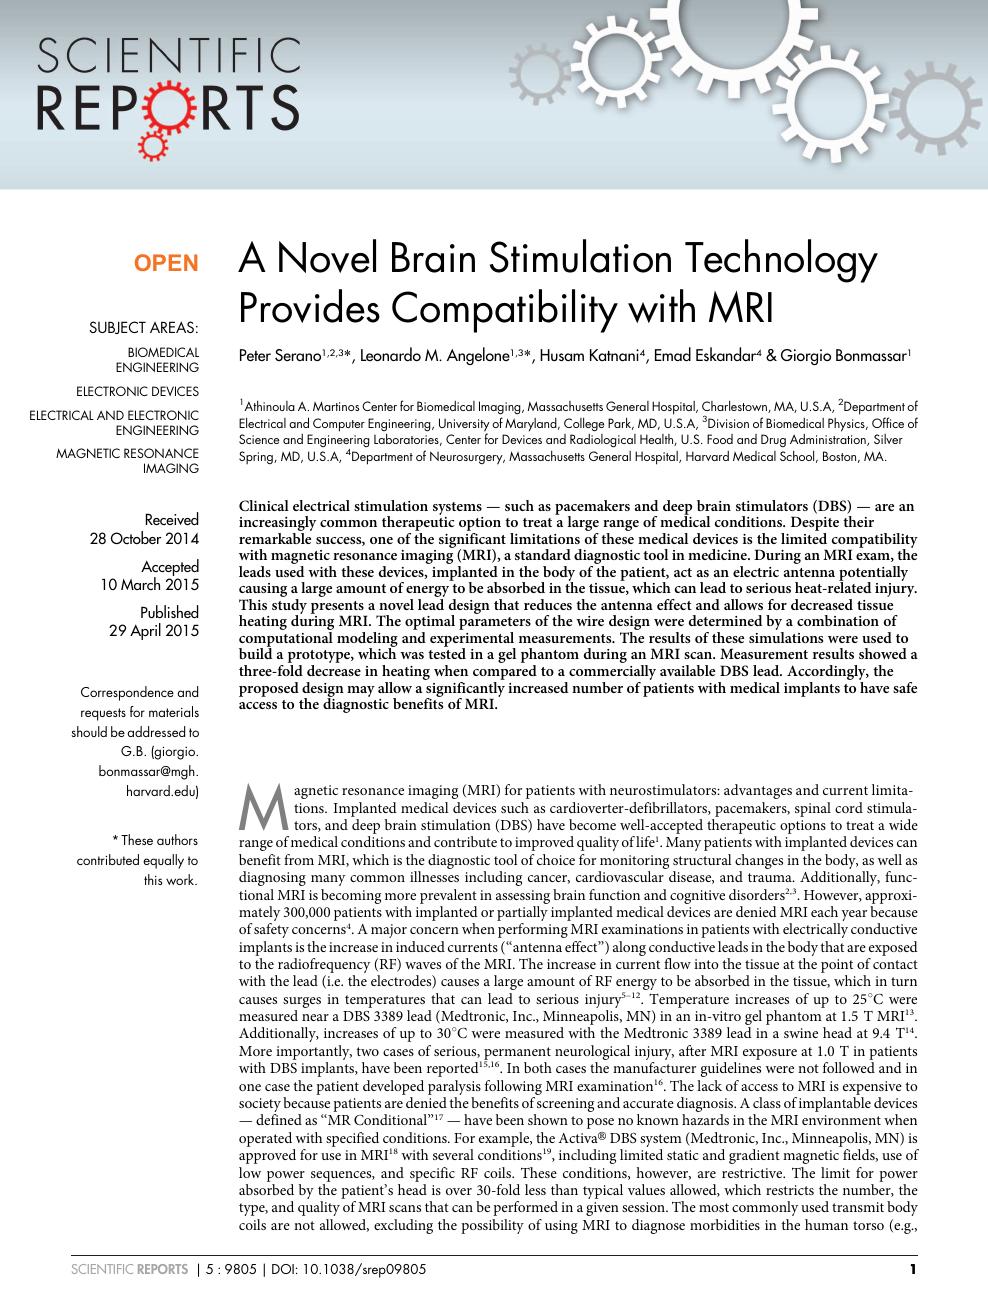 A Novel Brain Stimulation Technology Provides Compatibility with MRI